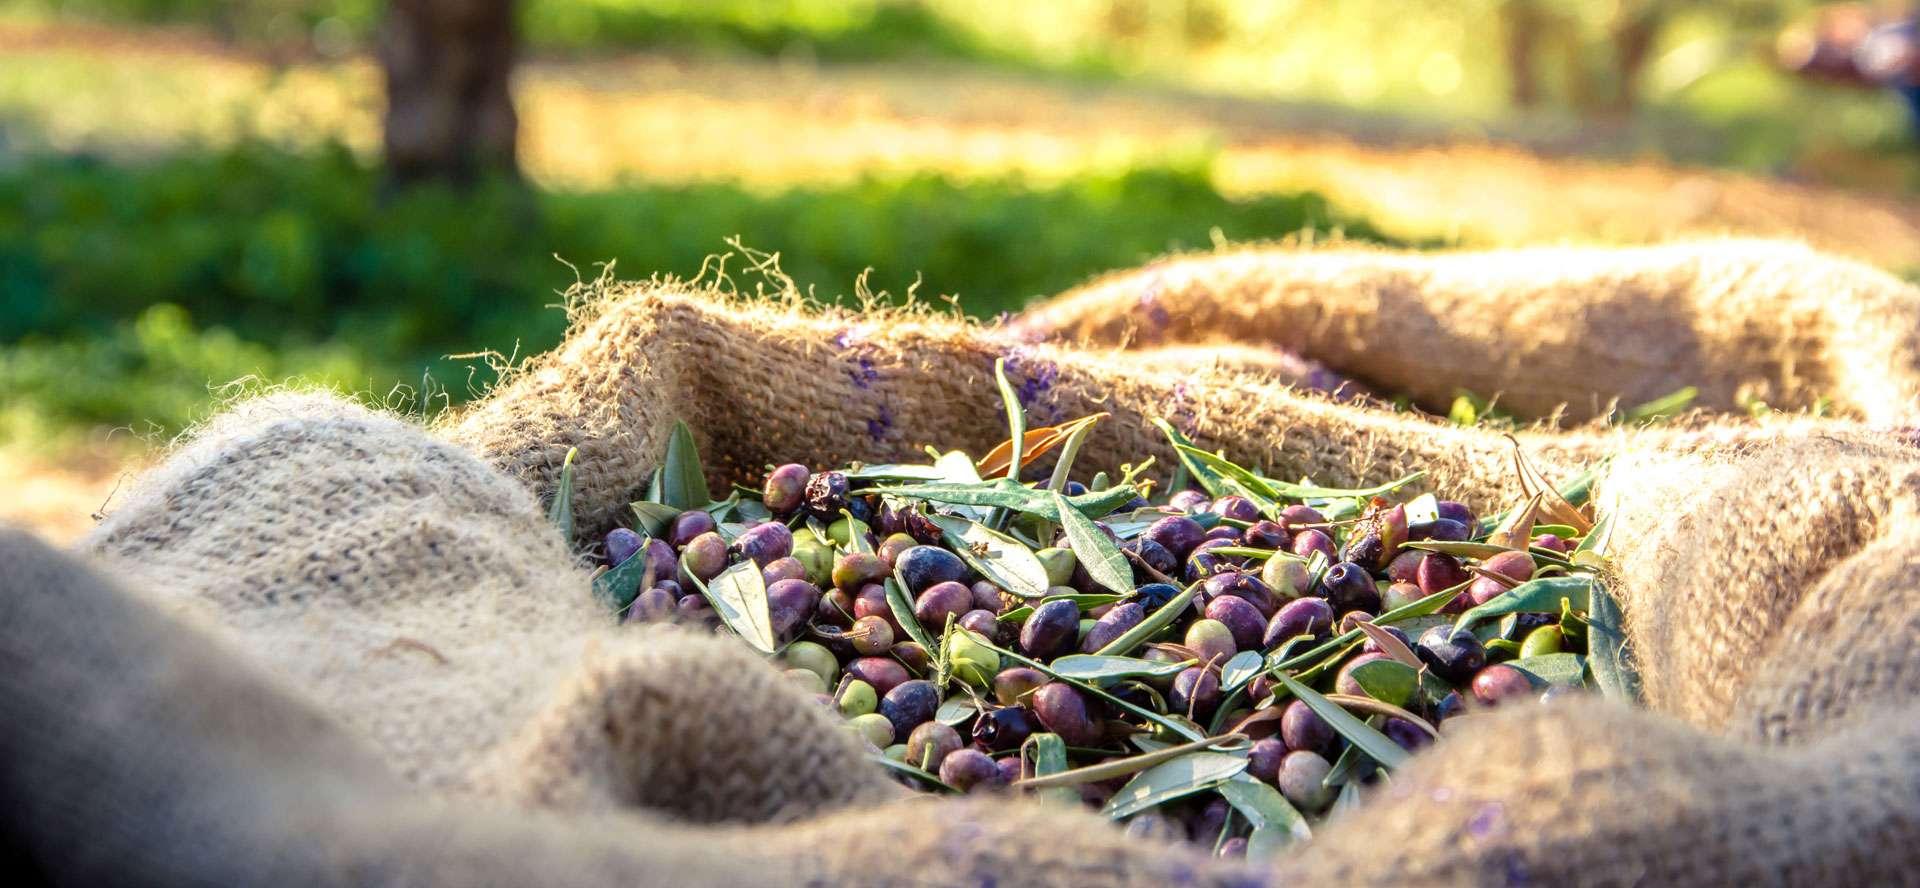 Tasting Tuscany's Extra-Virgin Olive Oil